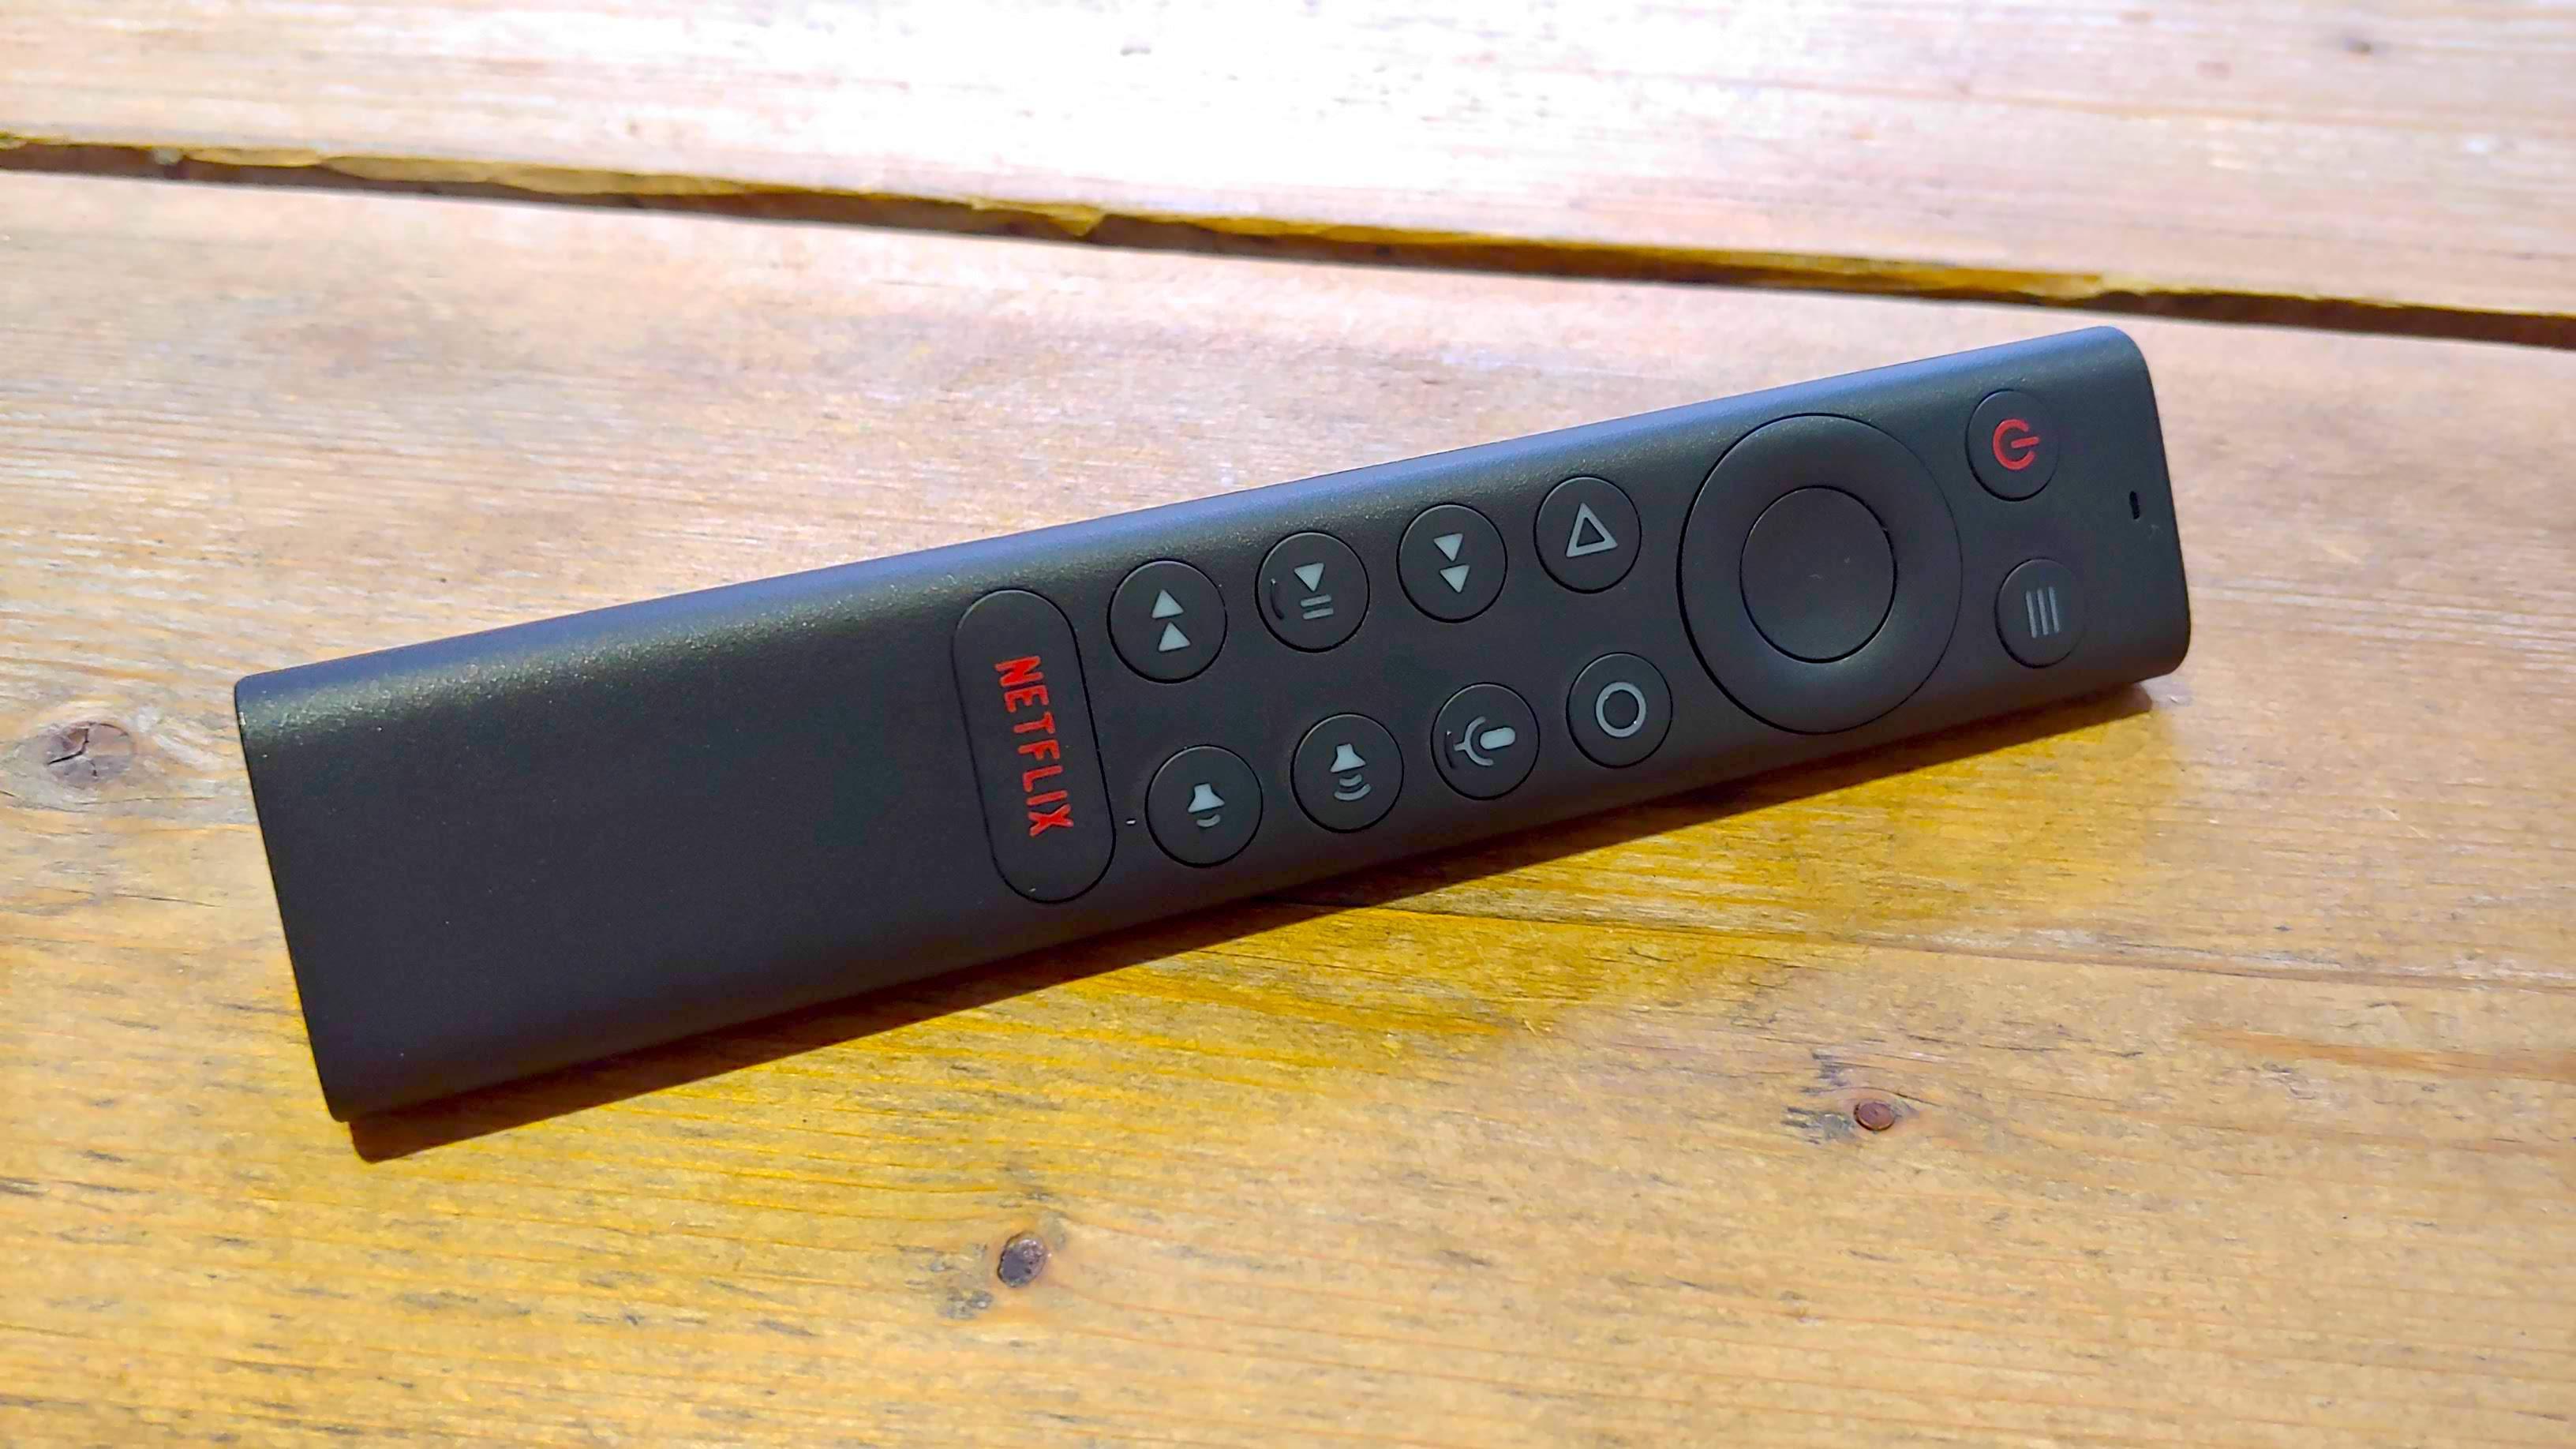 A close-up of the Nvidia Shield TV Pro remote control